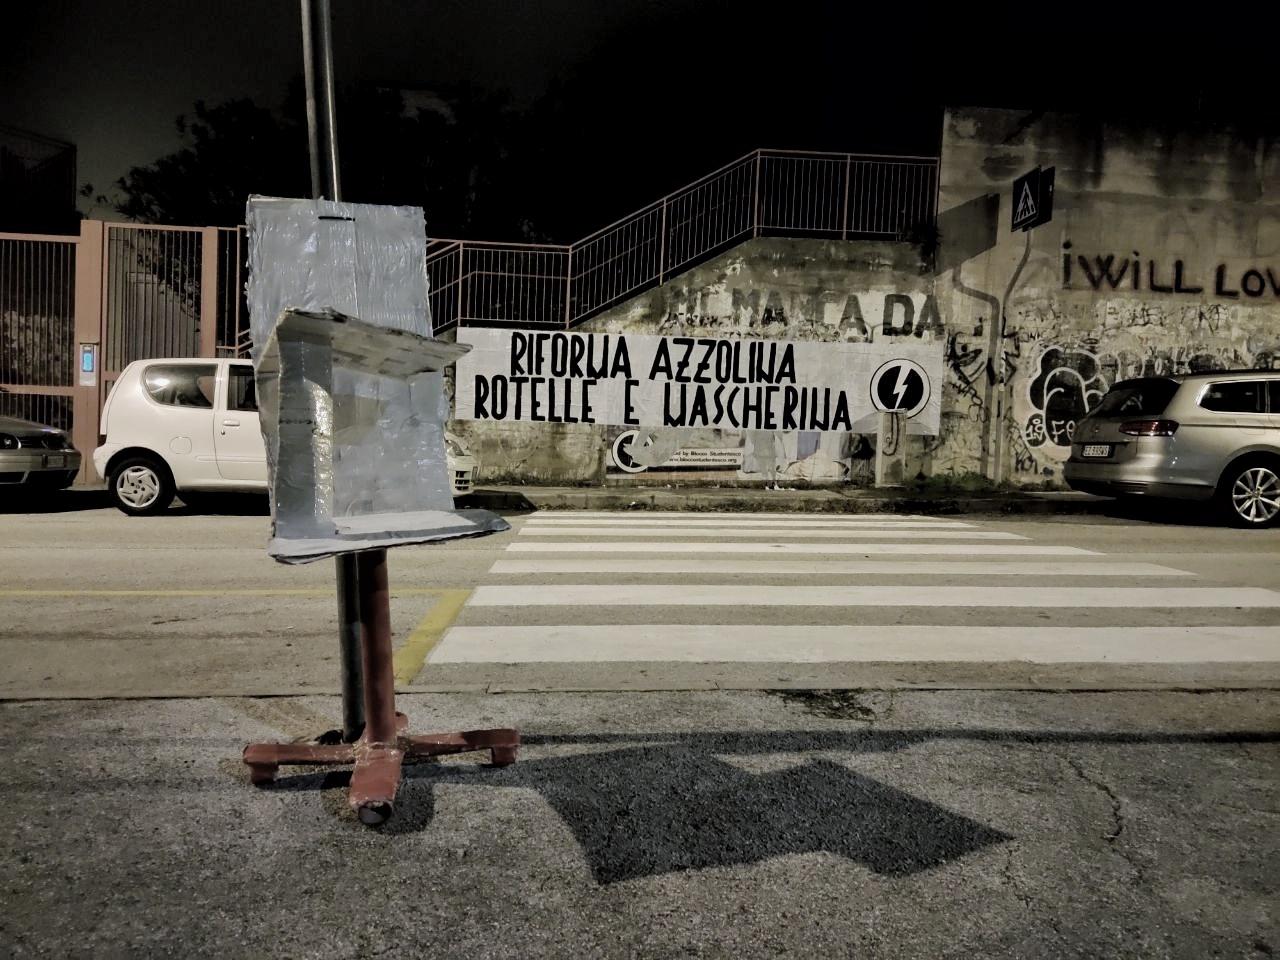 blocco studentesco fvg 20 ottobre azzolina rotelle mascherina